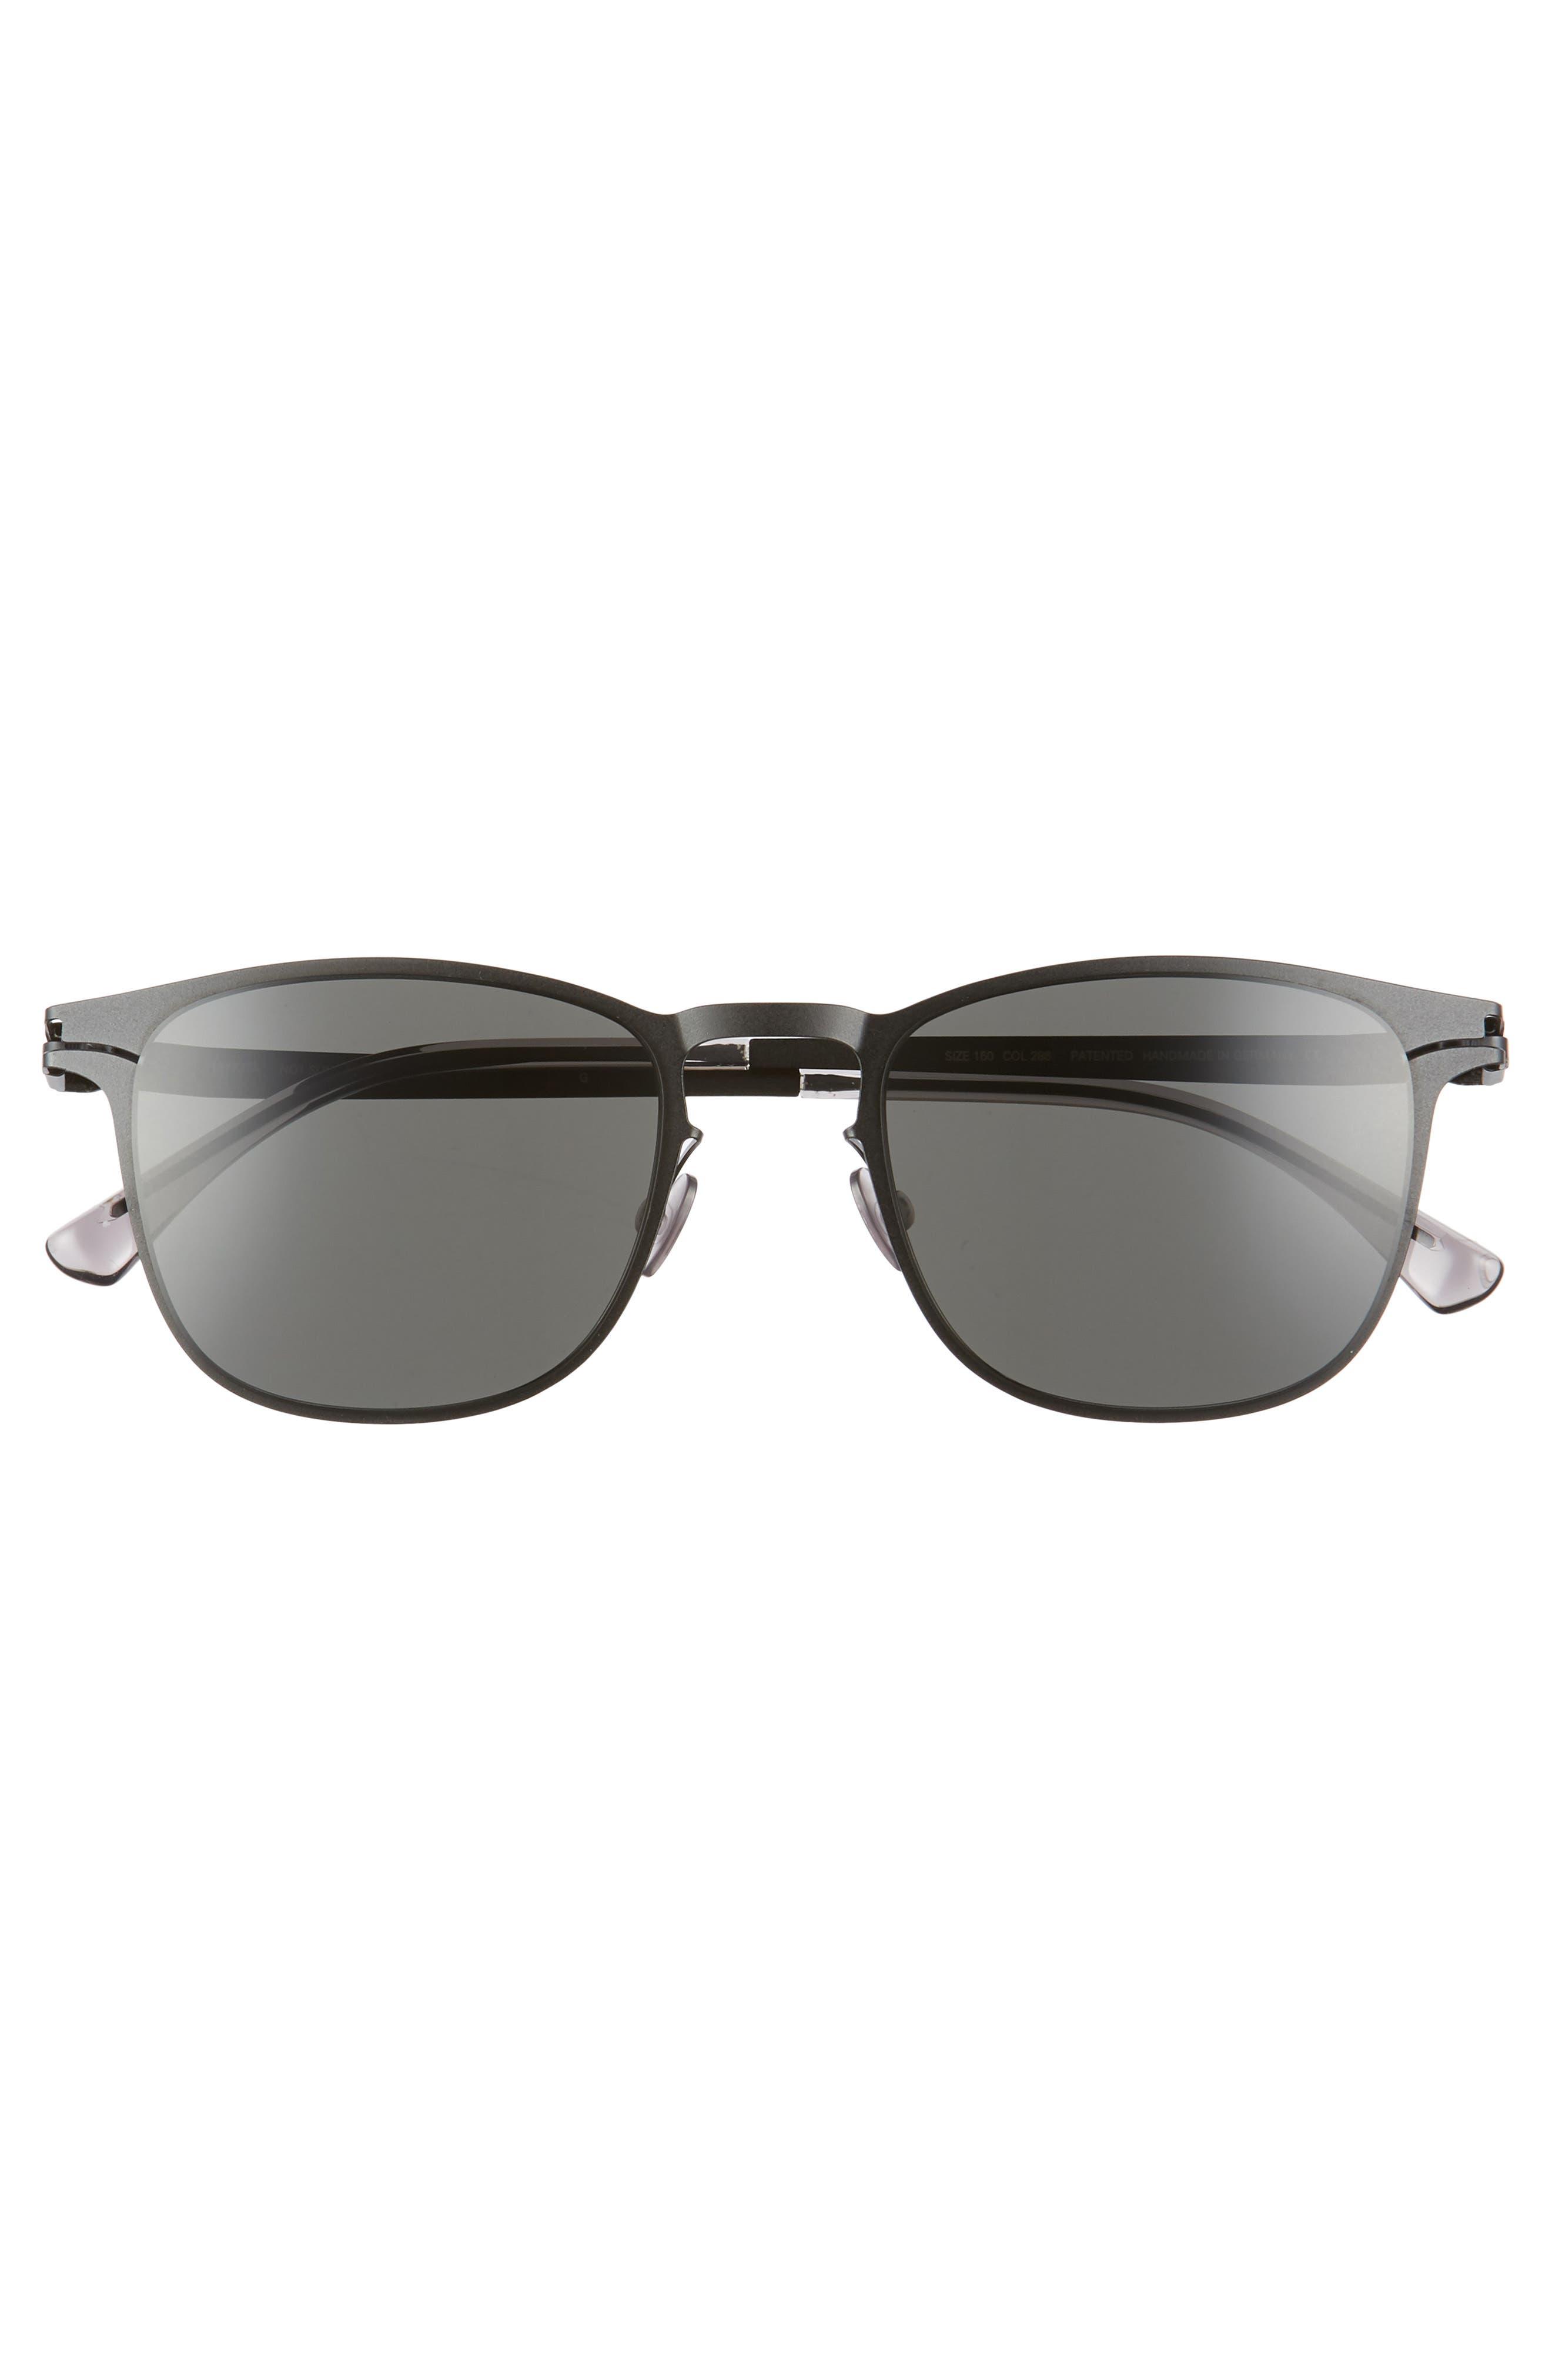 Riccardo 51mm Sunglasses,                             Alternate thumbnail 2, color,                             Matte Black